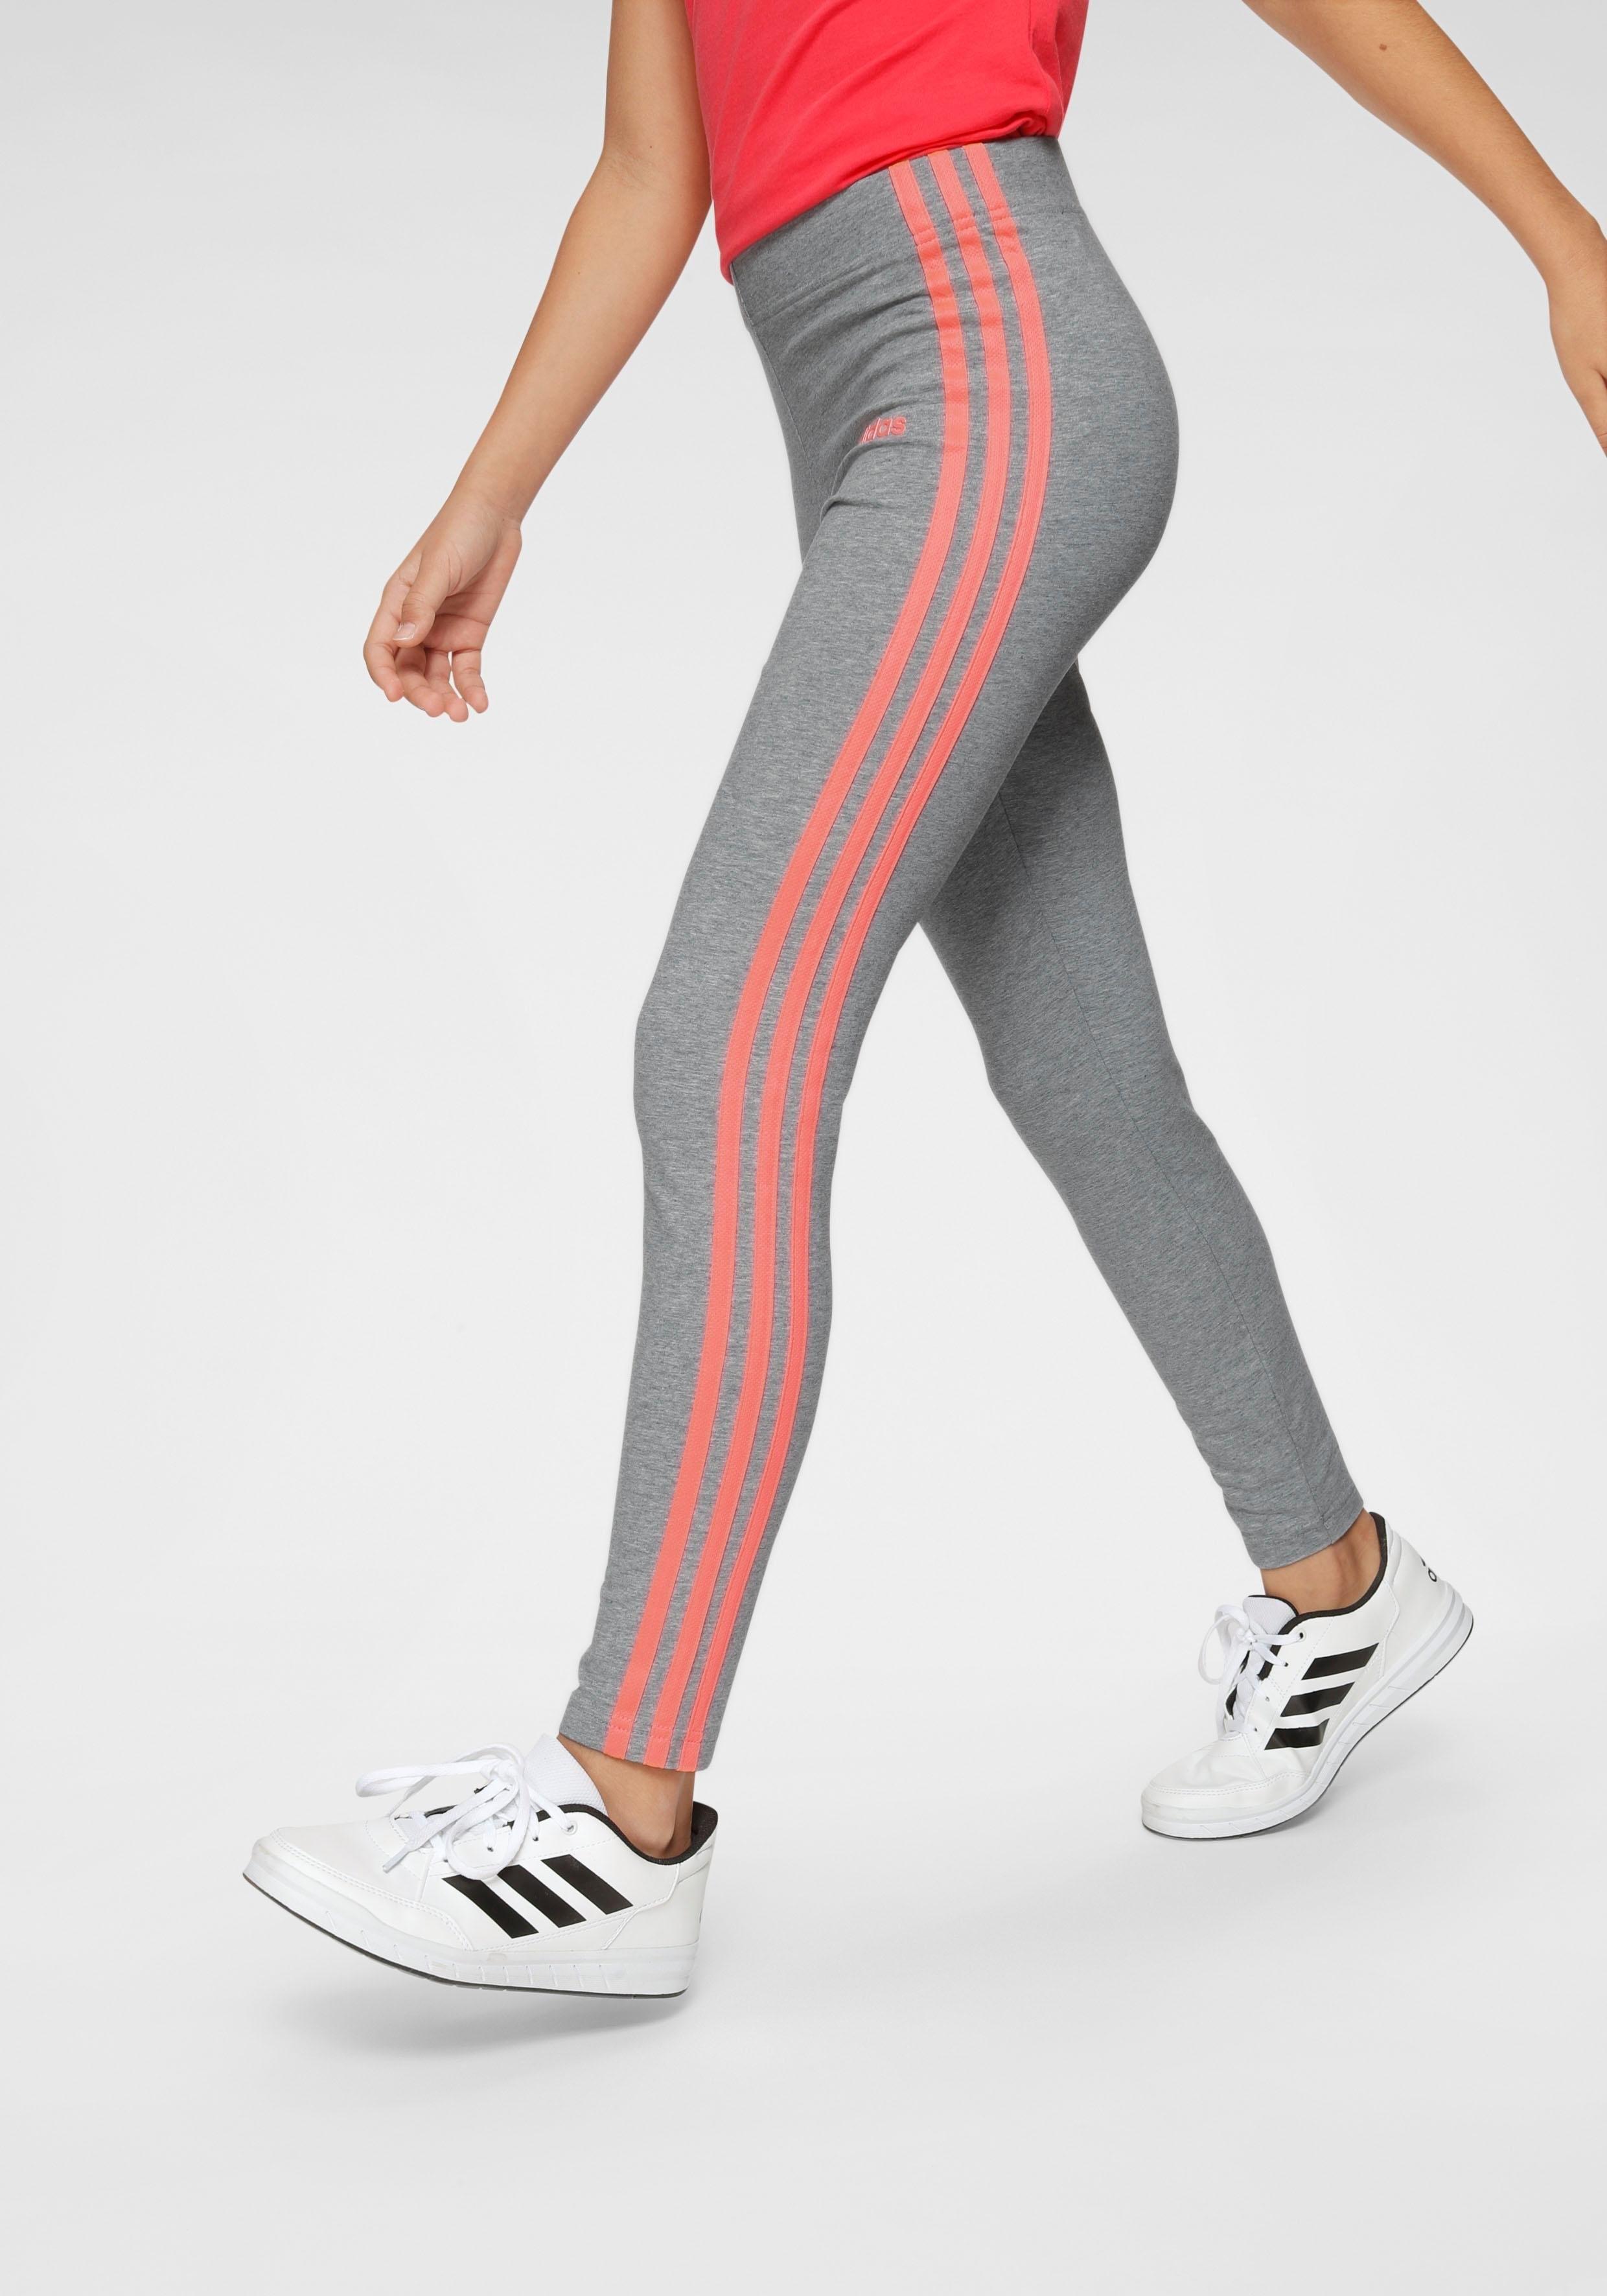 adidas Performance adidas legging »E 3 STRIPES TIGHT« - verschillende betaalmethodes